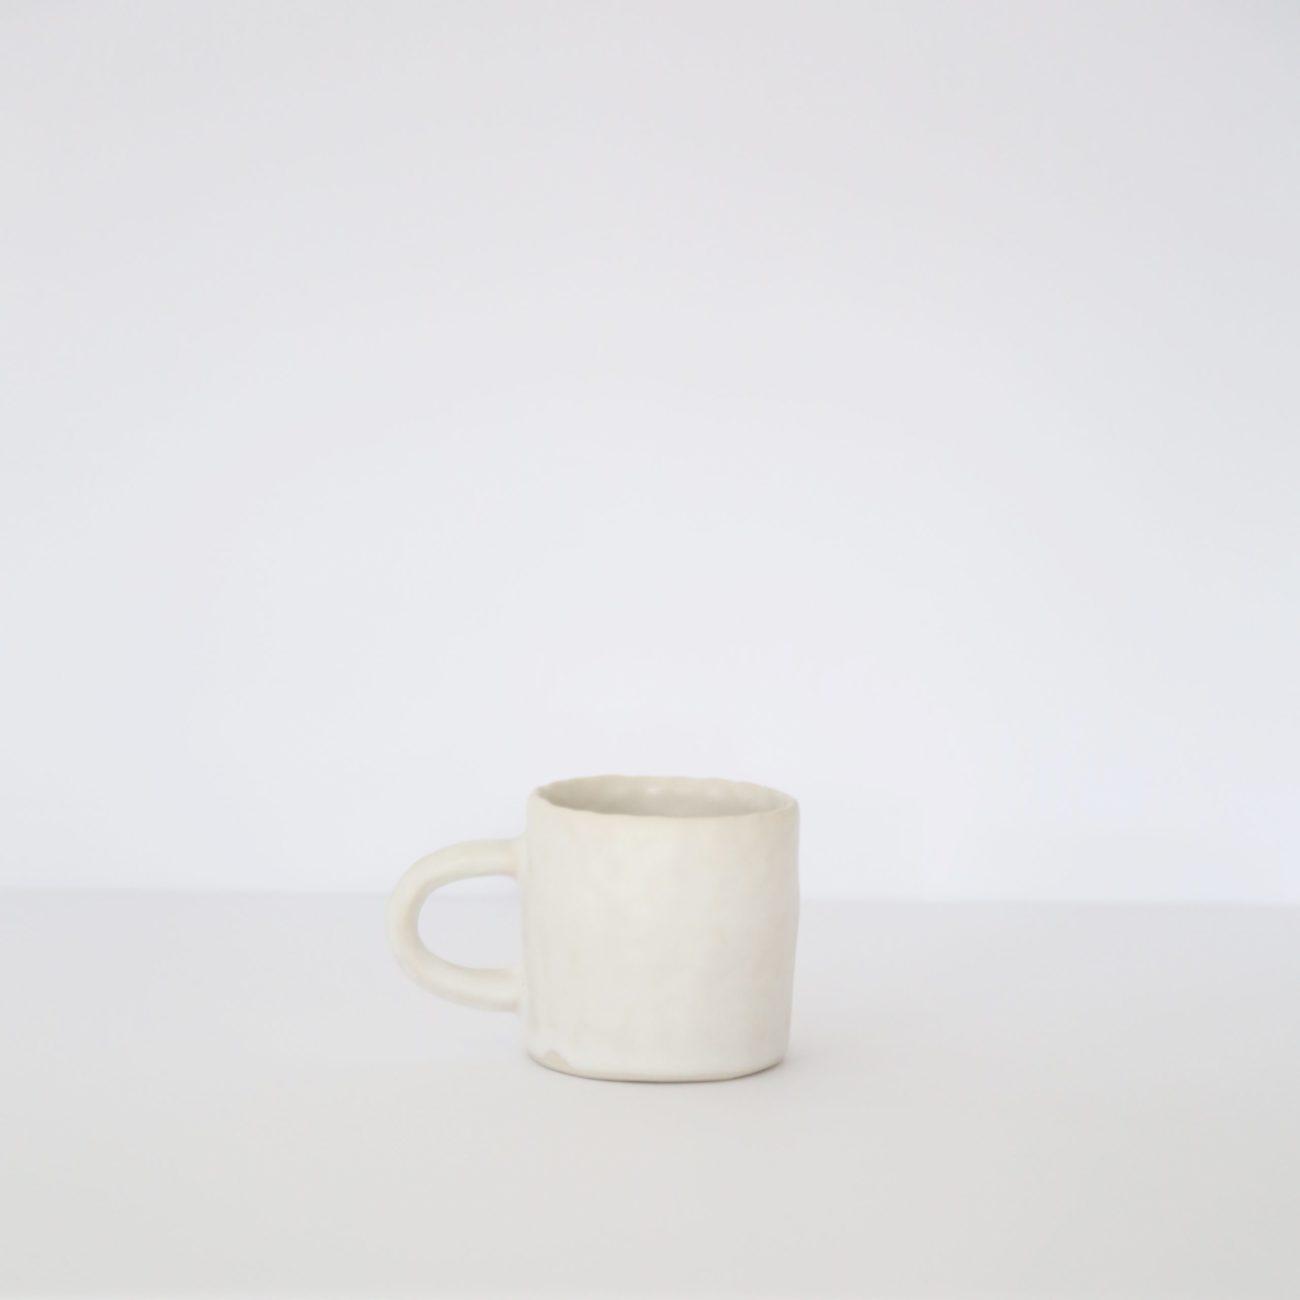 Small Ceramic Mug, Warm White